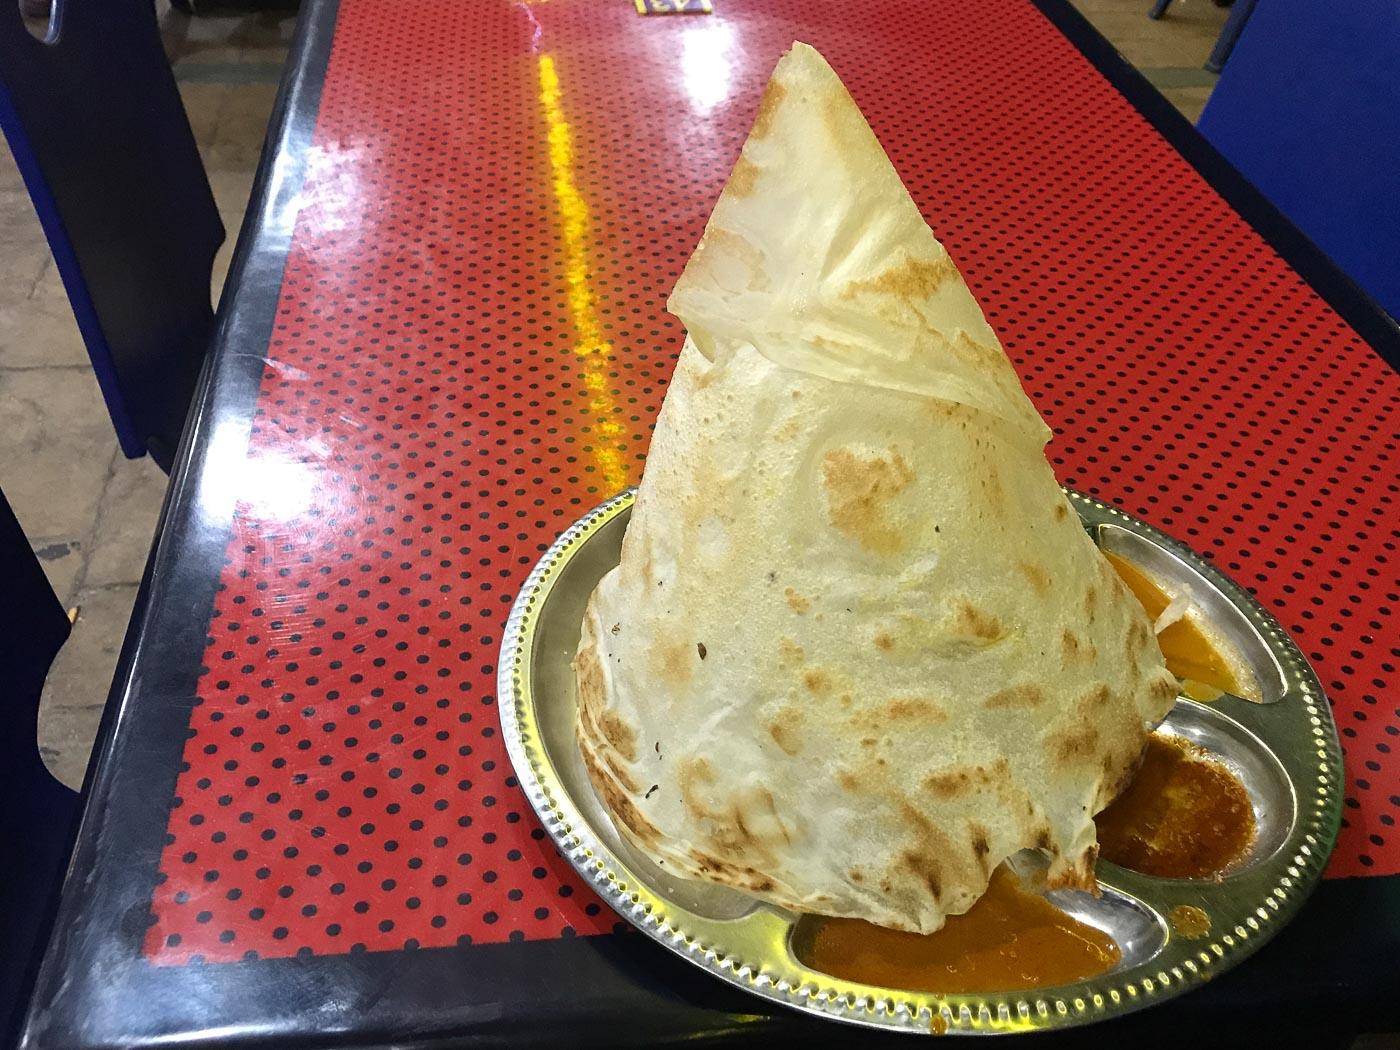 Pyramid shaped roti a top curry sauce - Roti Channi